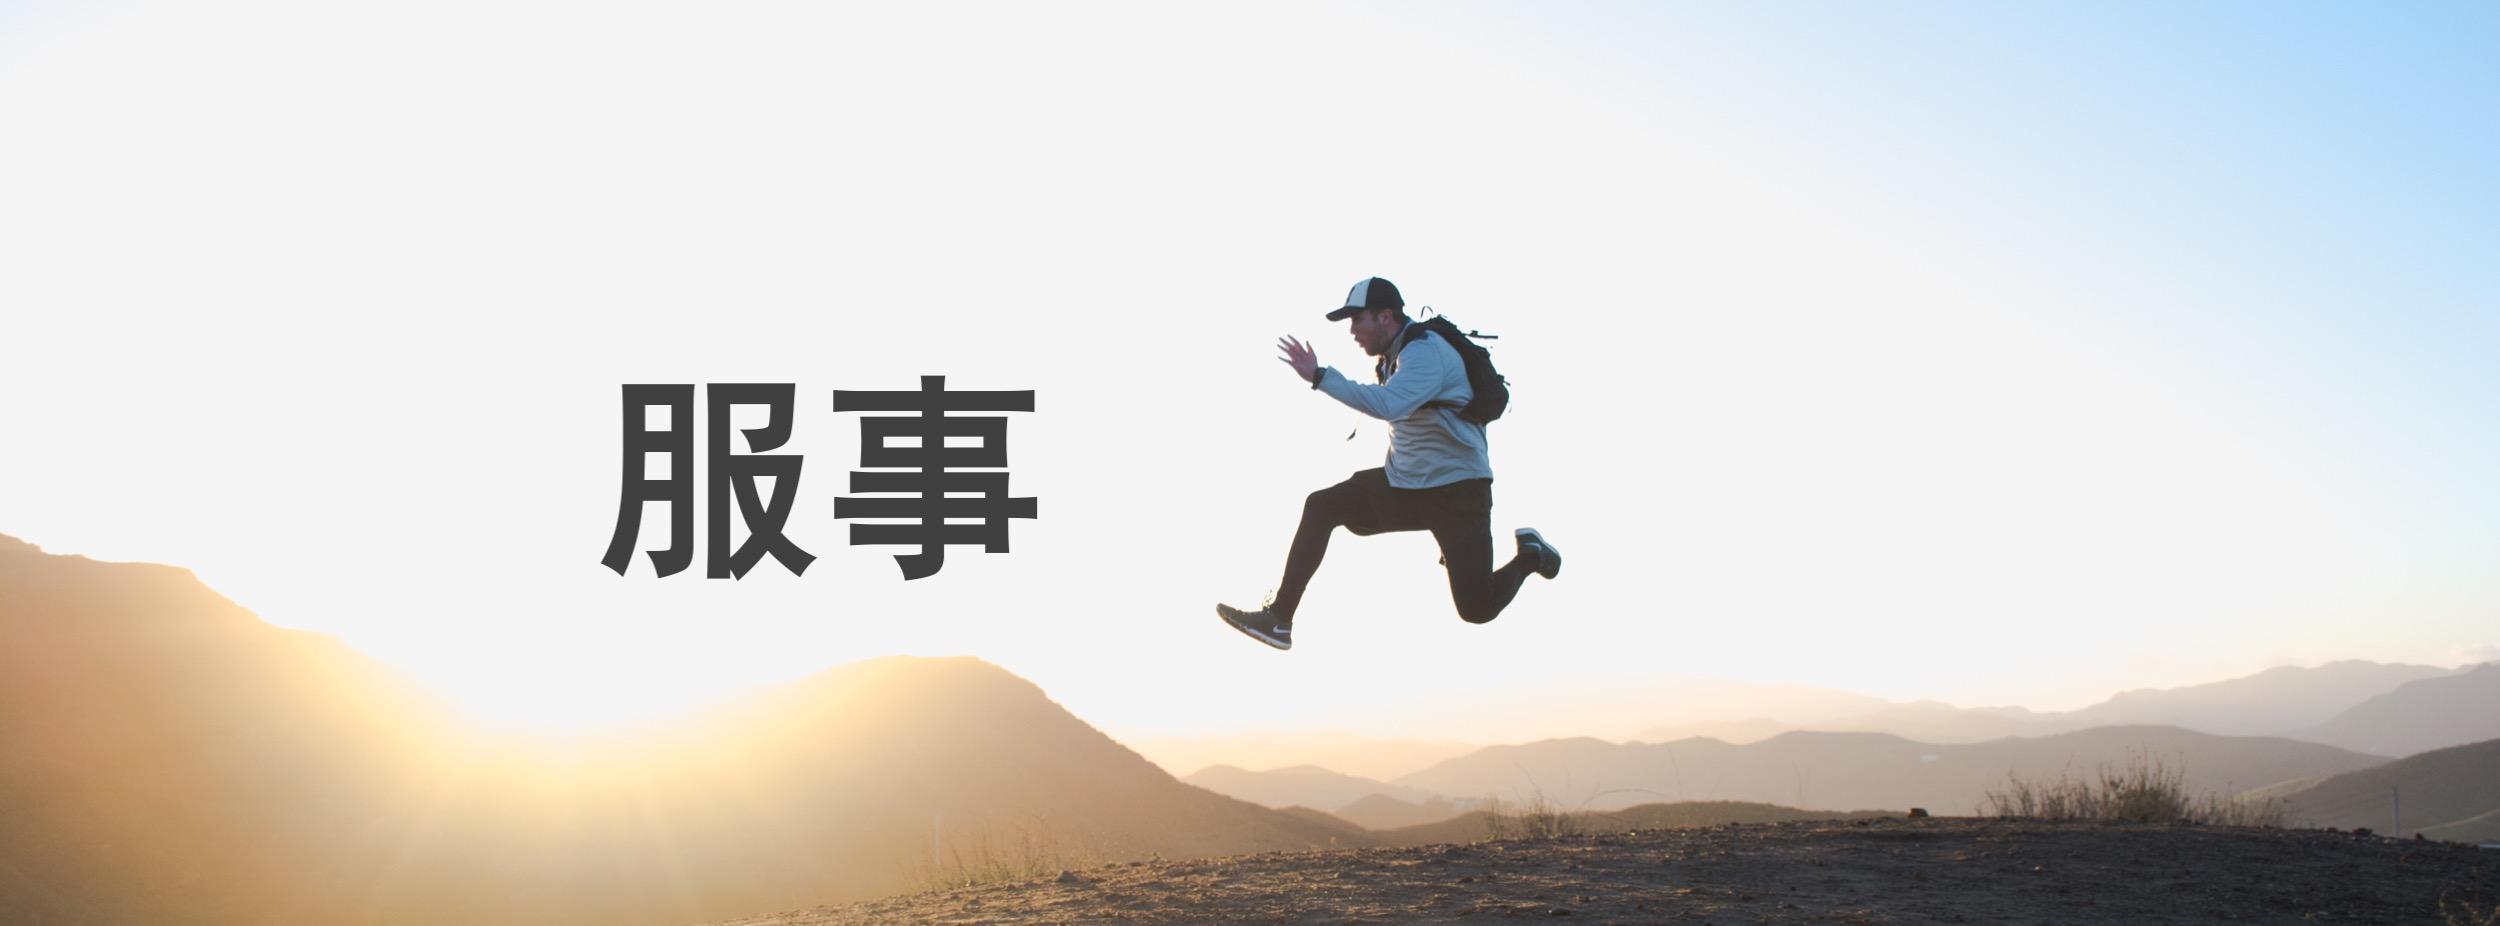 Serve - Chinese